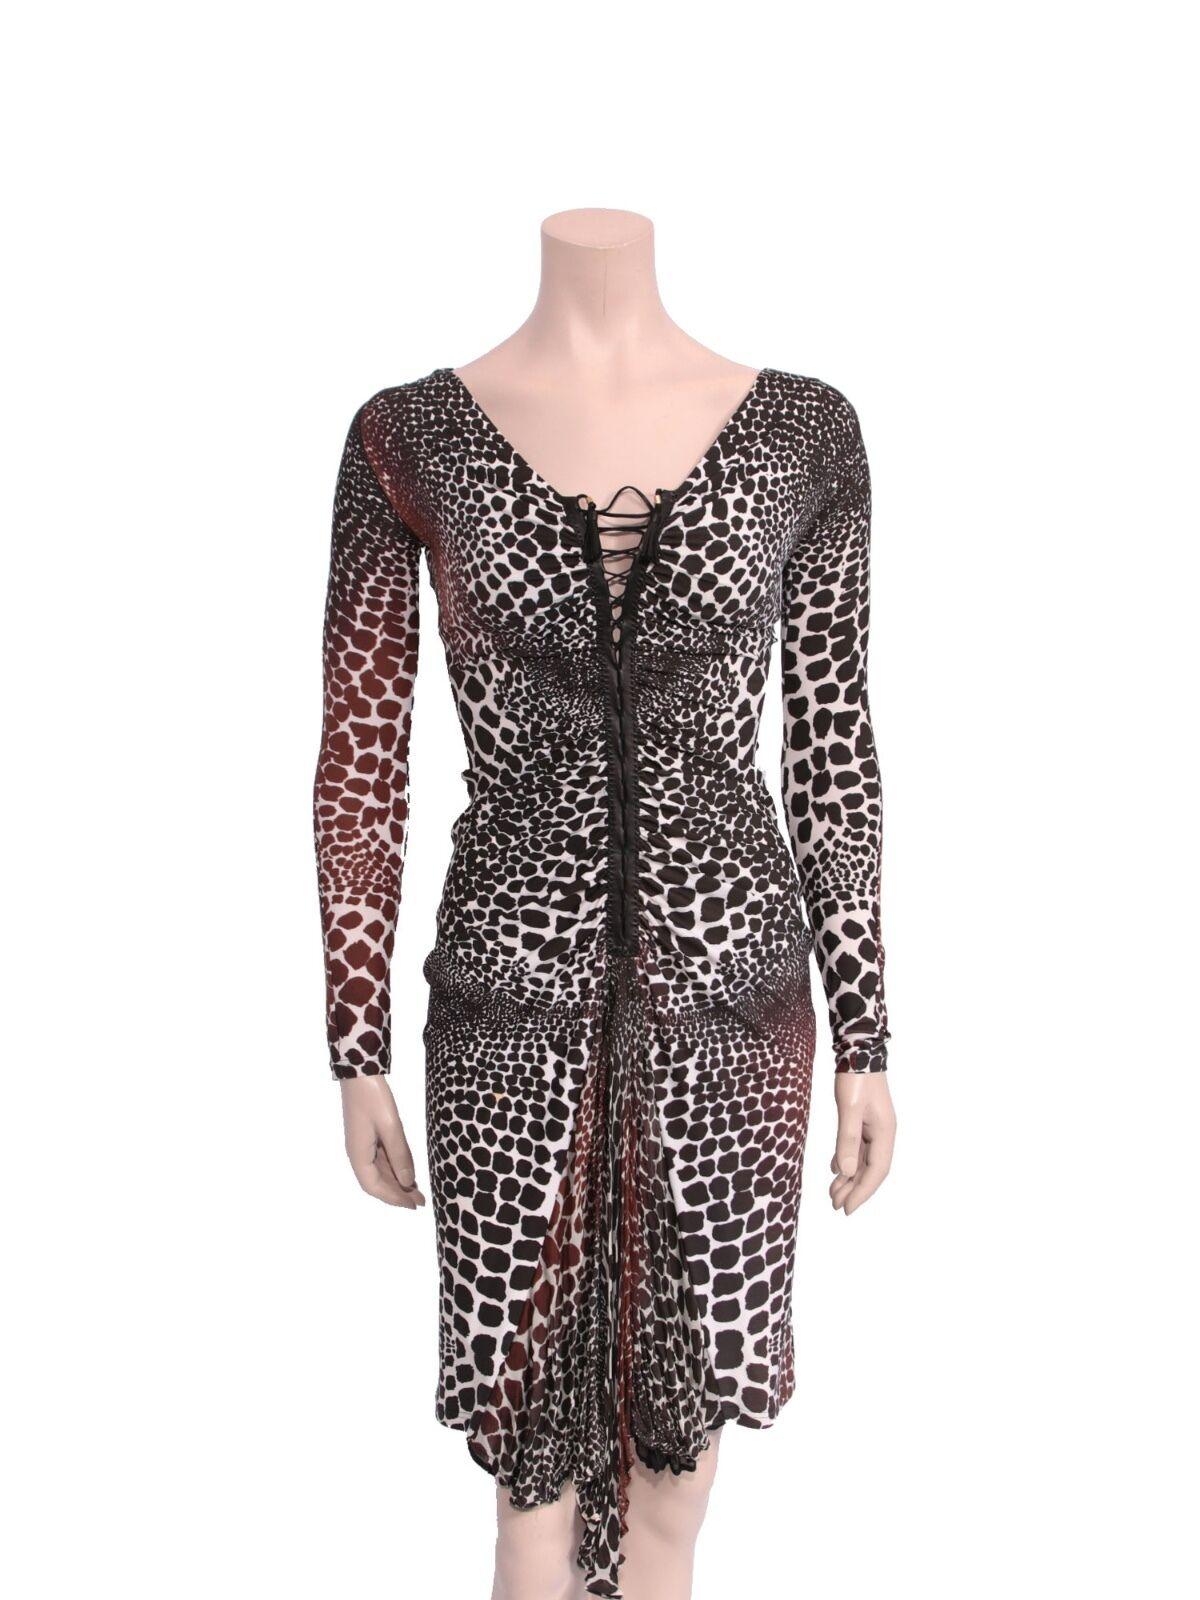 ROBERTO CAVALLI Printed Lace-Up Dress (SIZE XS)